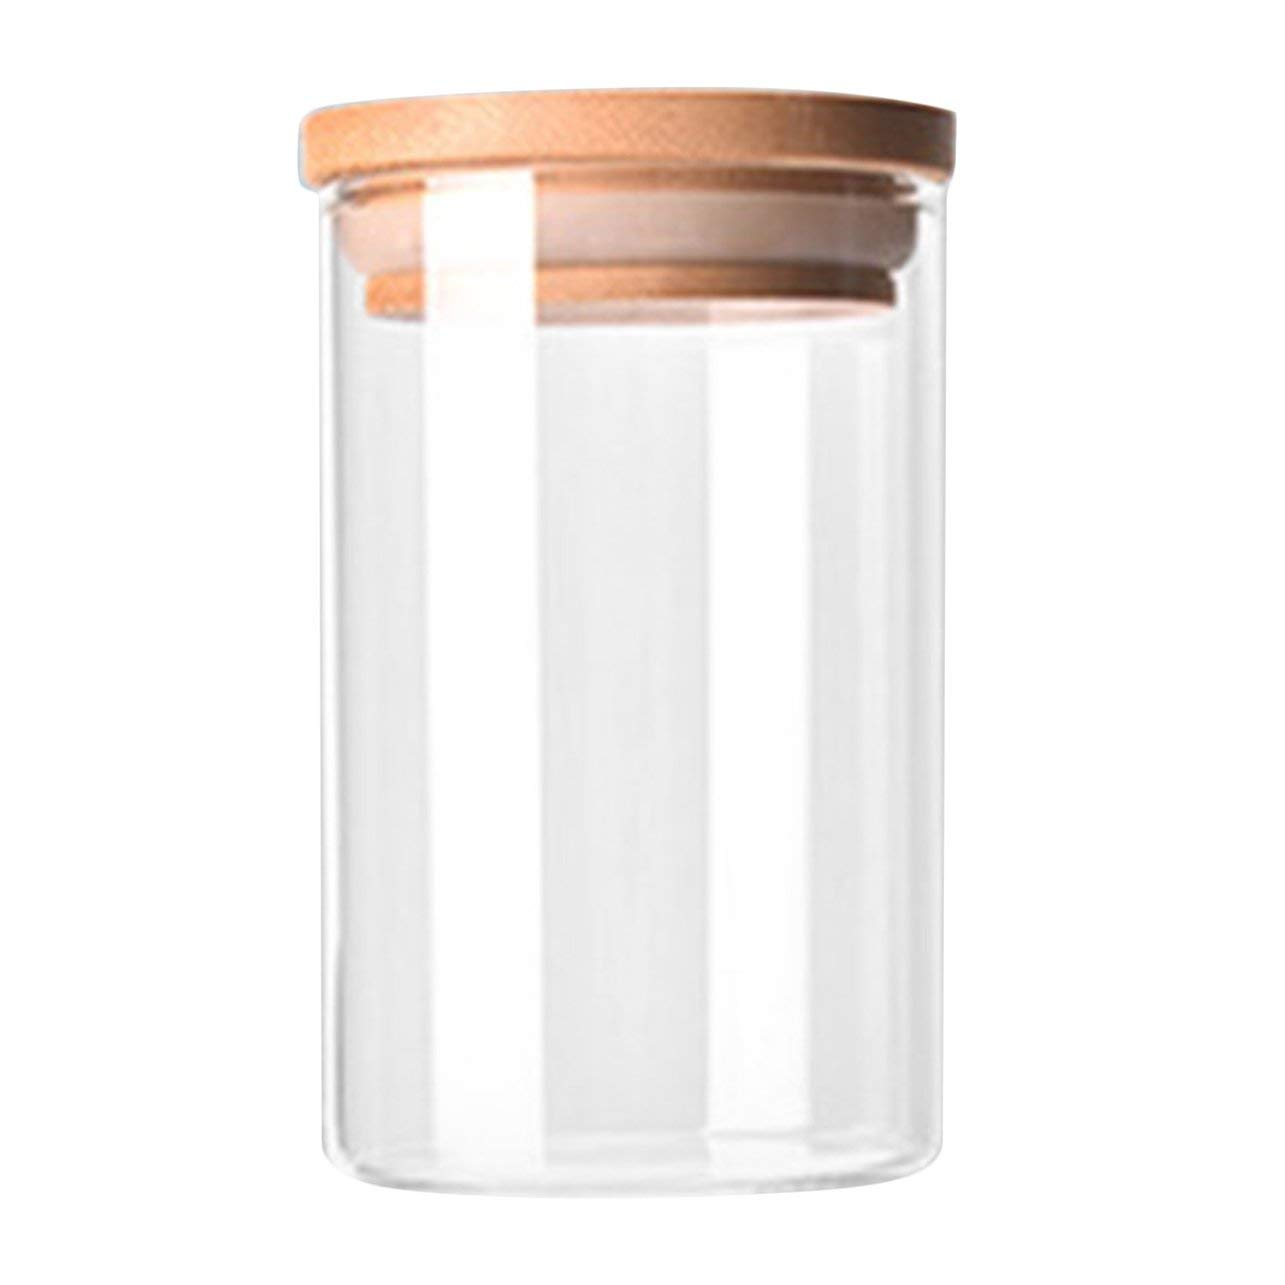 WOSOSYEYO Transparente Alto Borosilicato Vidrio Cocina Almacenaje Botella Tienda Ingrediente del alimento Caramelo Galleta Almacenaje Tarro Organizaci/ón